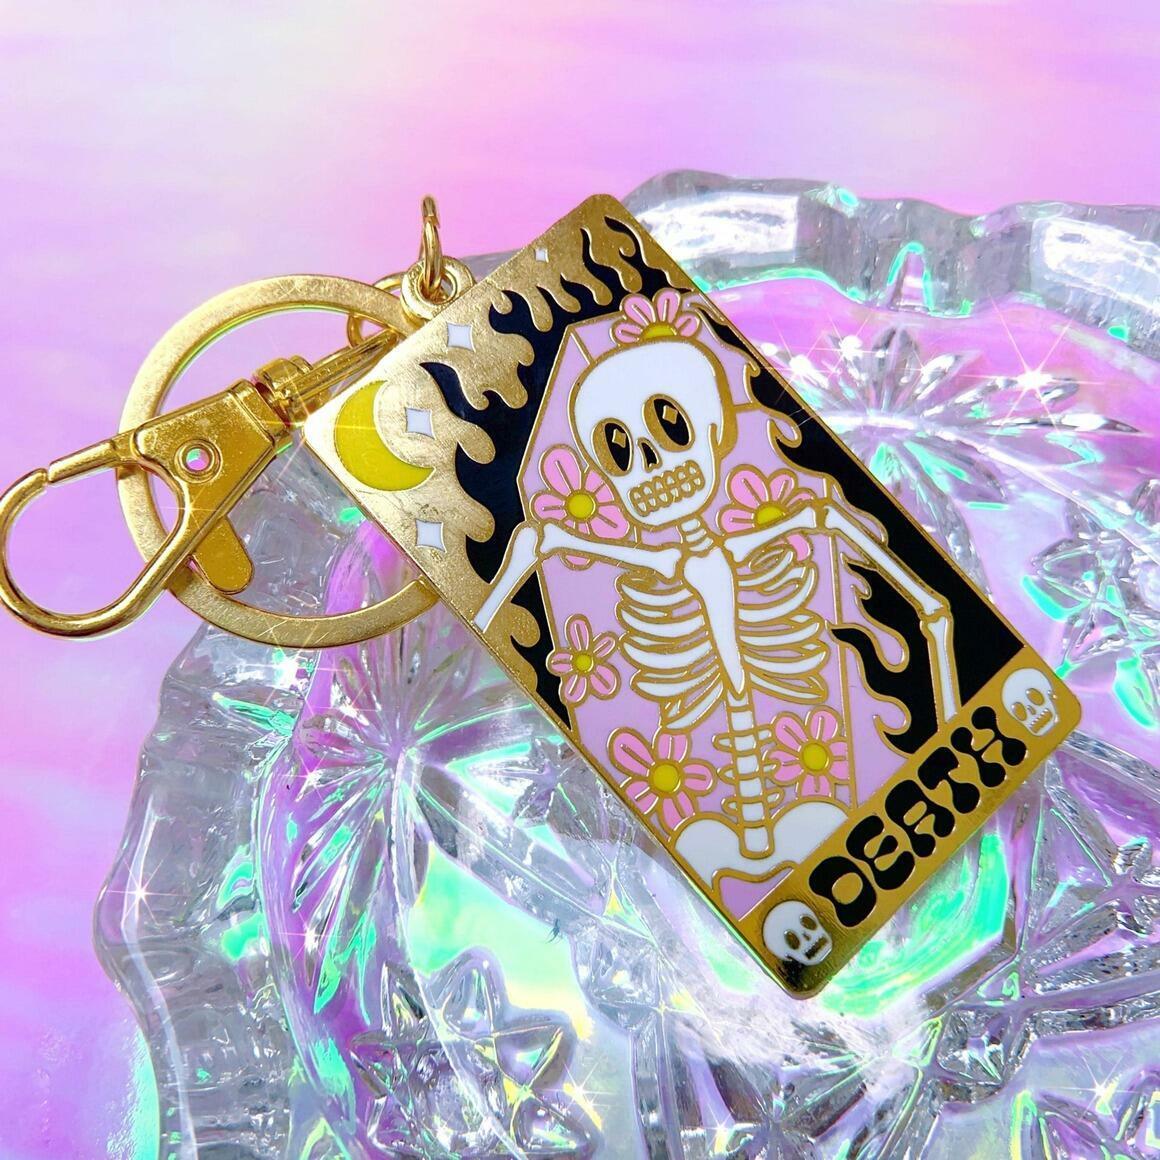 Death tarot card keychain   Trada Marketplace